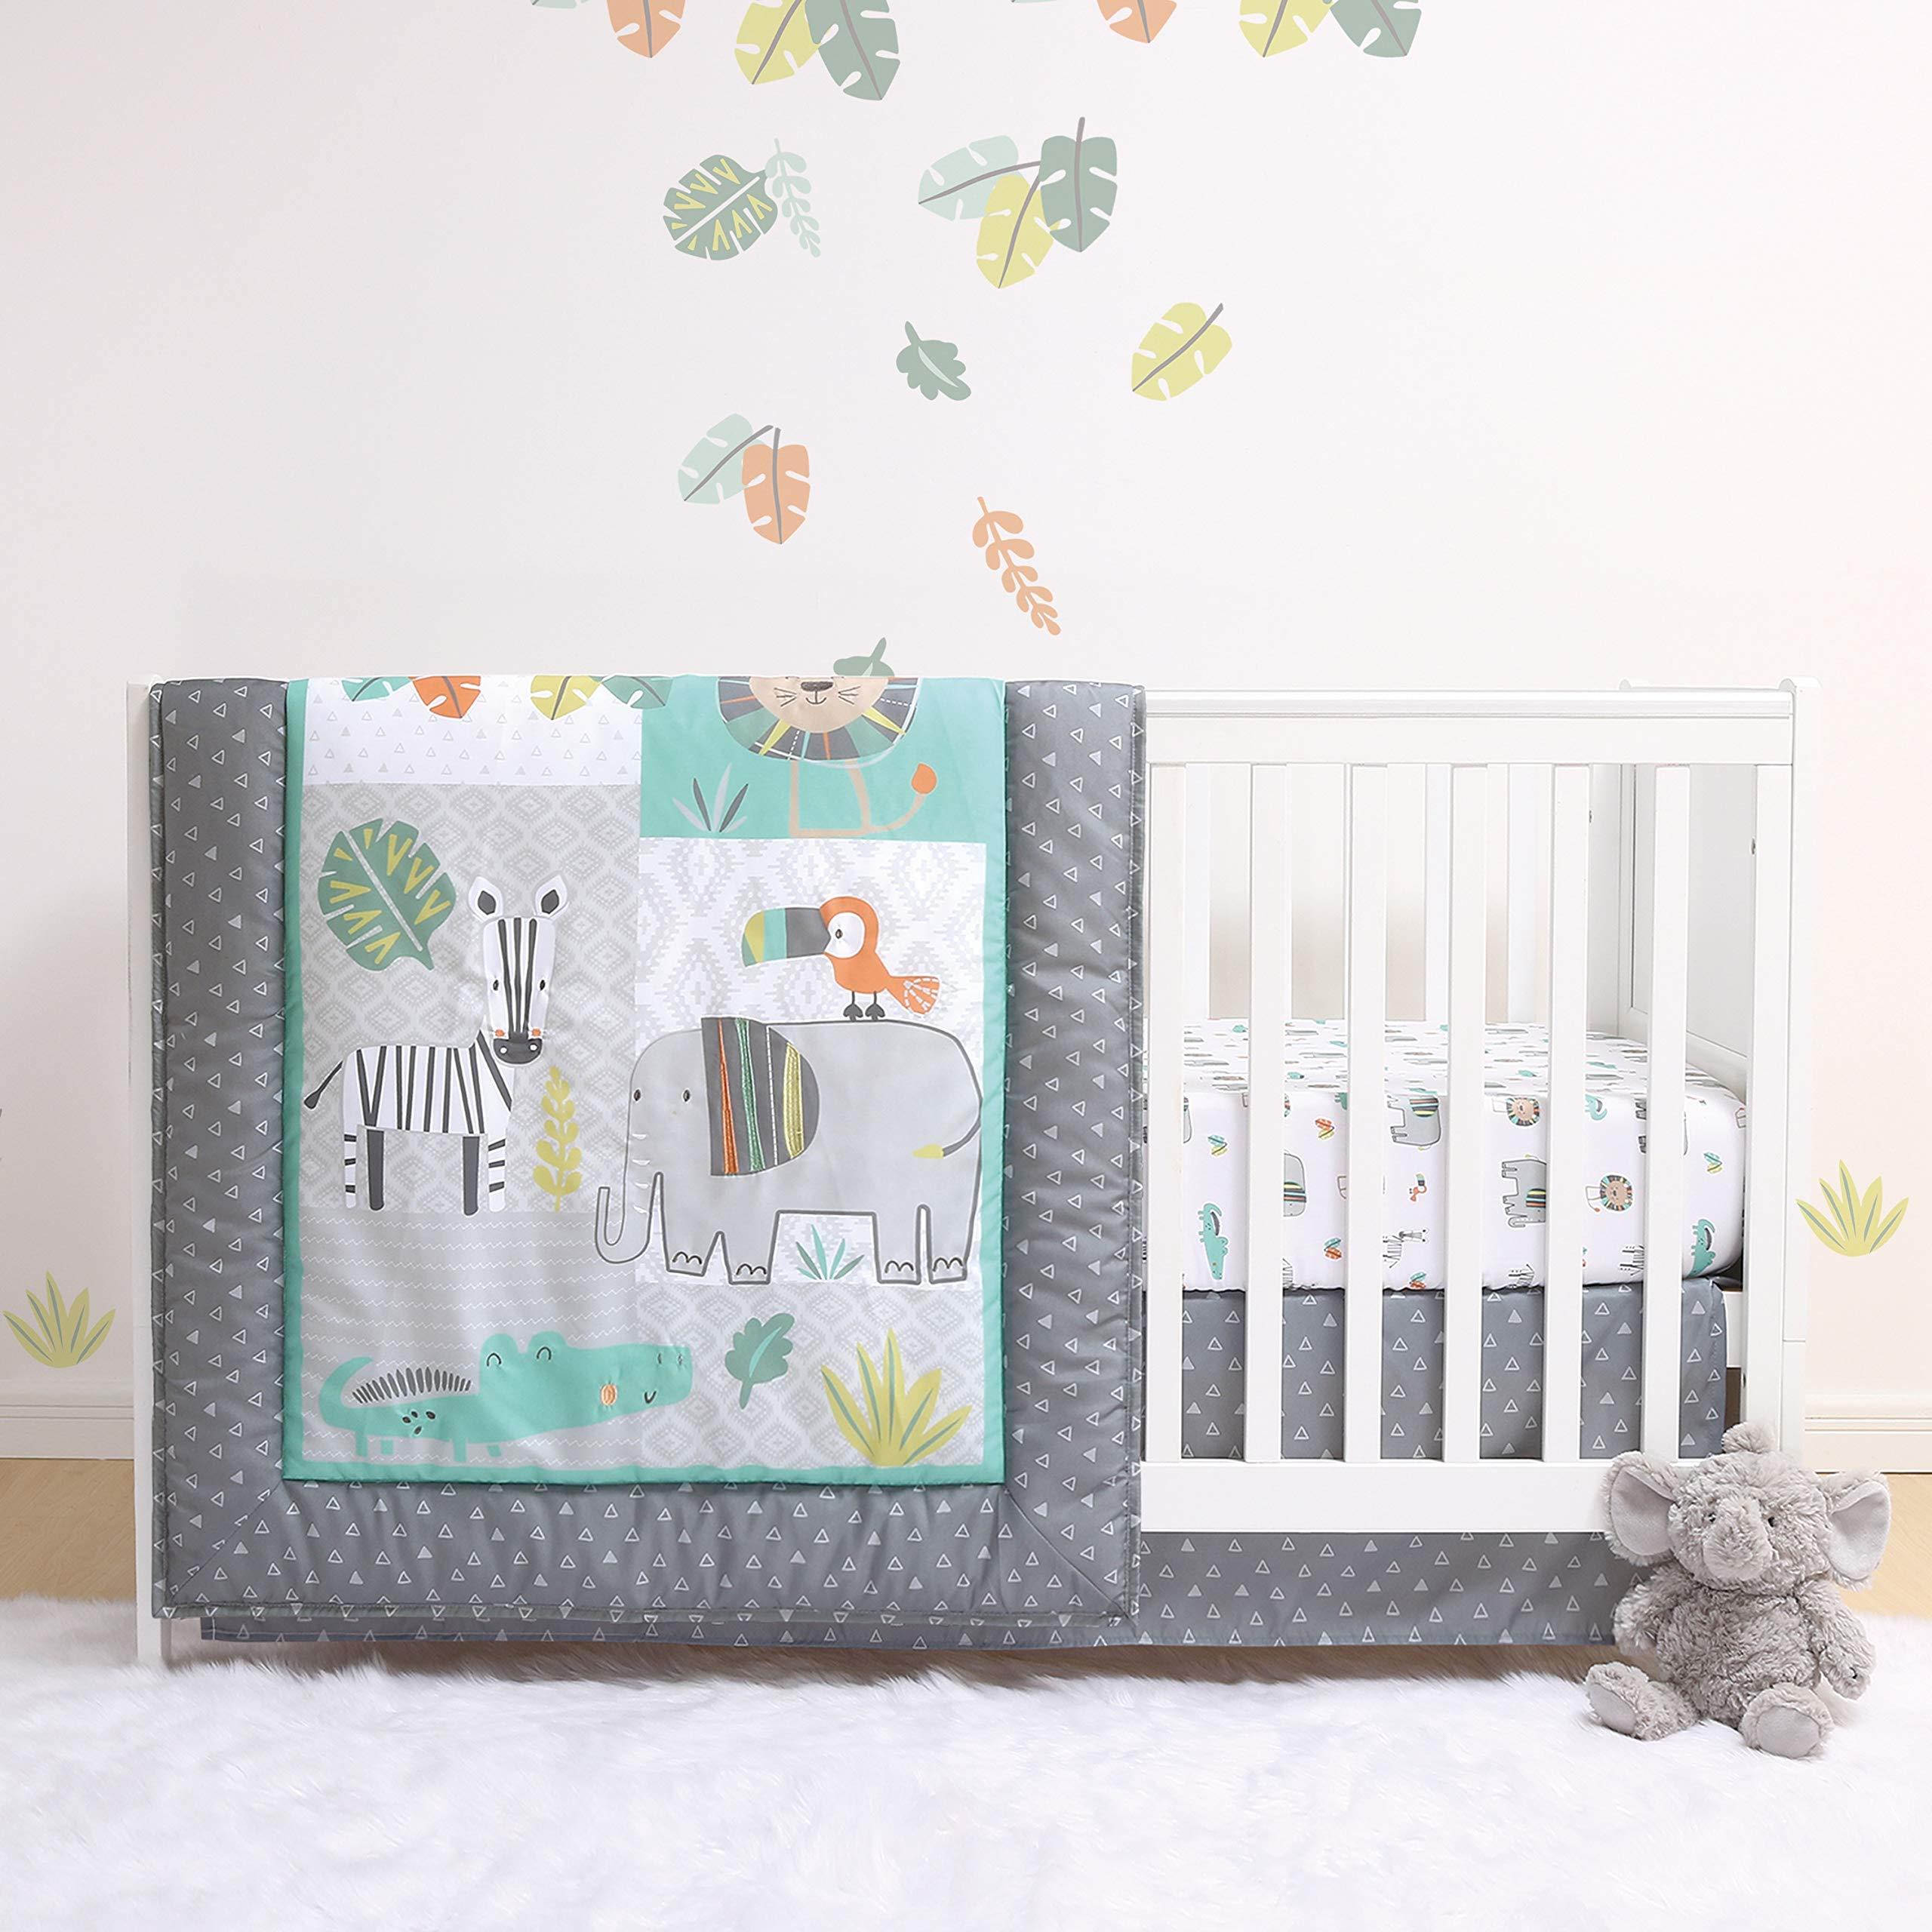 100/% Cotton Breathable /& Hypoallergenic TEALP Crib Bumper Blue Bear Fox Nursery Cot Bed Bumper Baby Cot Bumper Padded 210cm x 30cm